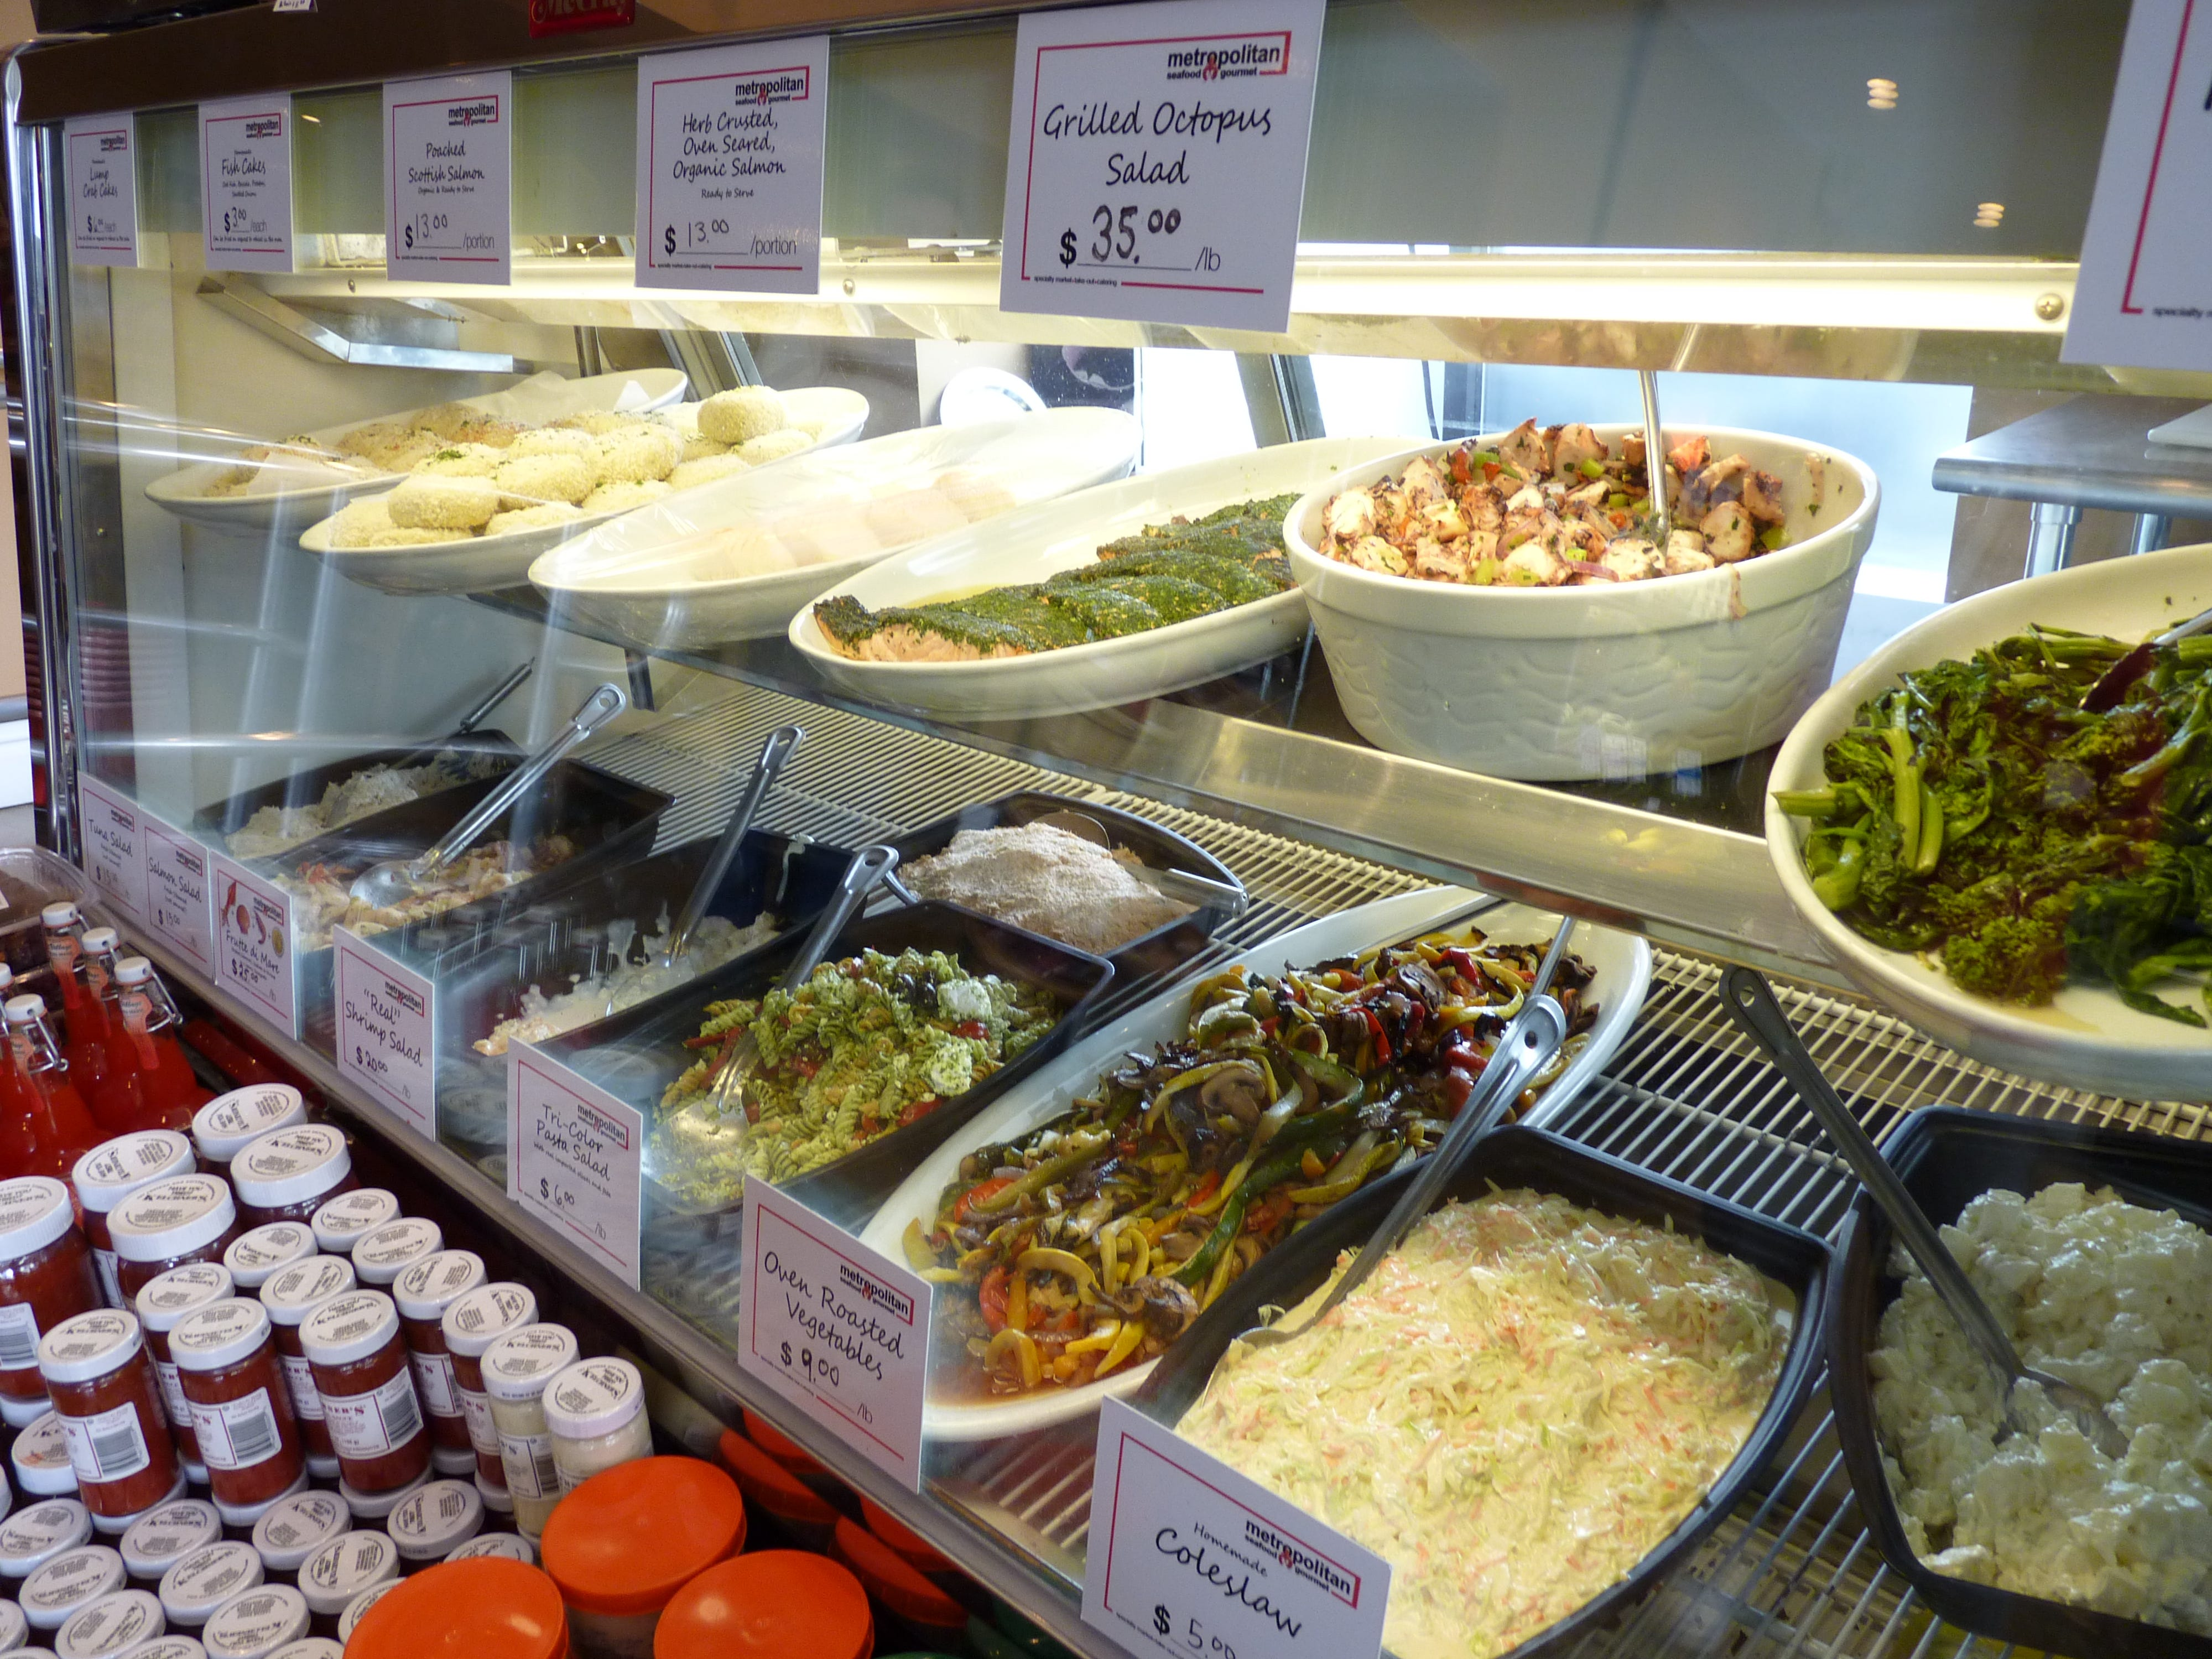 Salads displayed at Metropolitan Seafood & Gourmet in Lebanon.